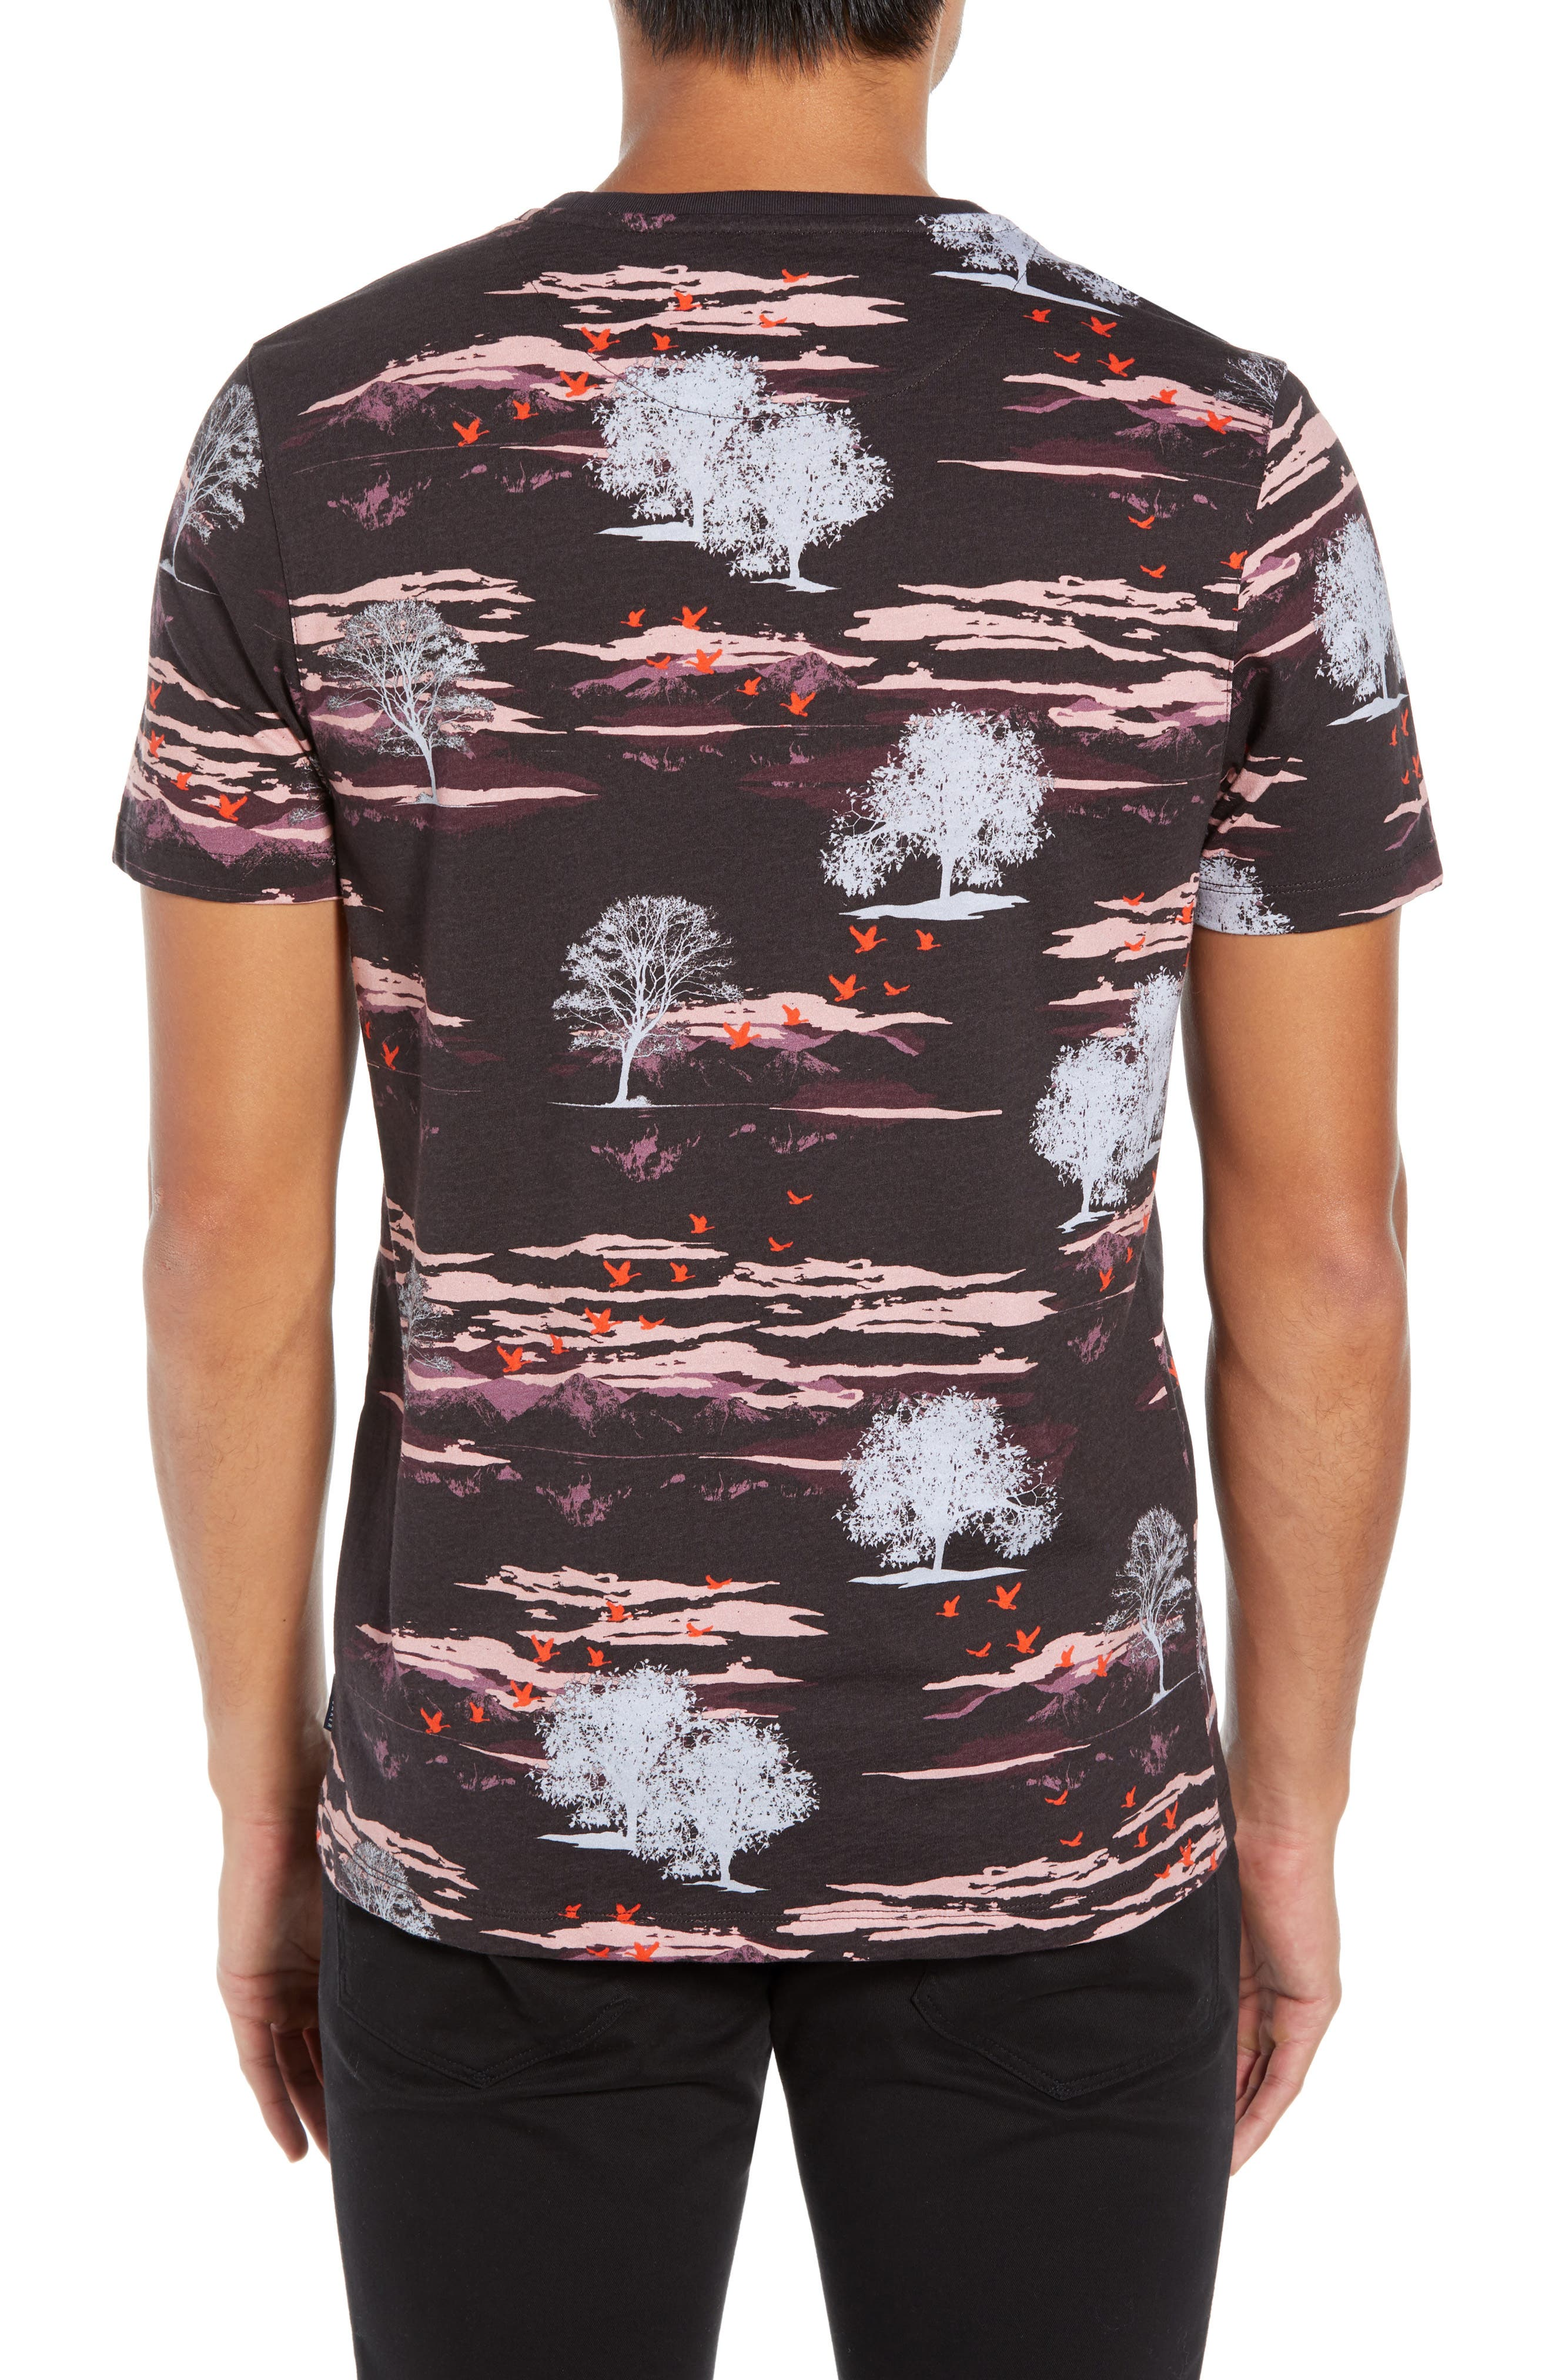 Happie Slim Fit Print T-Shirt,                             Alternate thumbnail 2, color,                             601